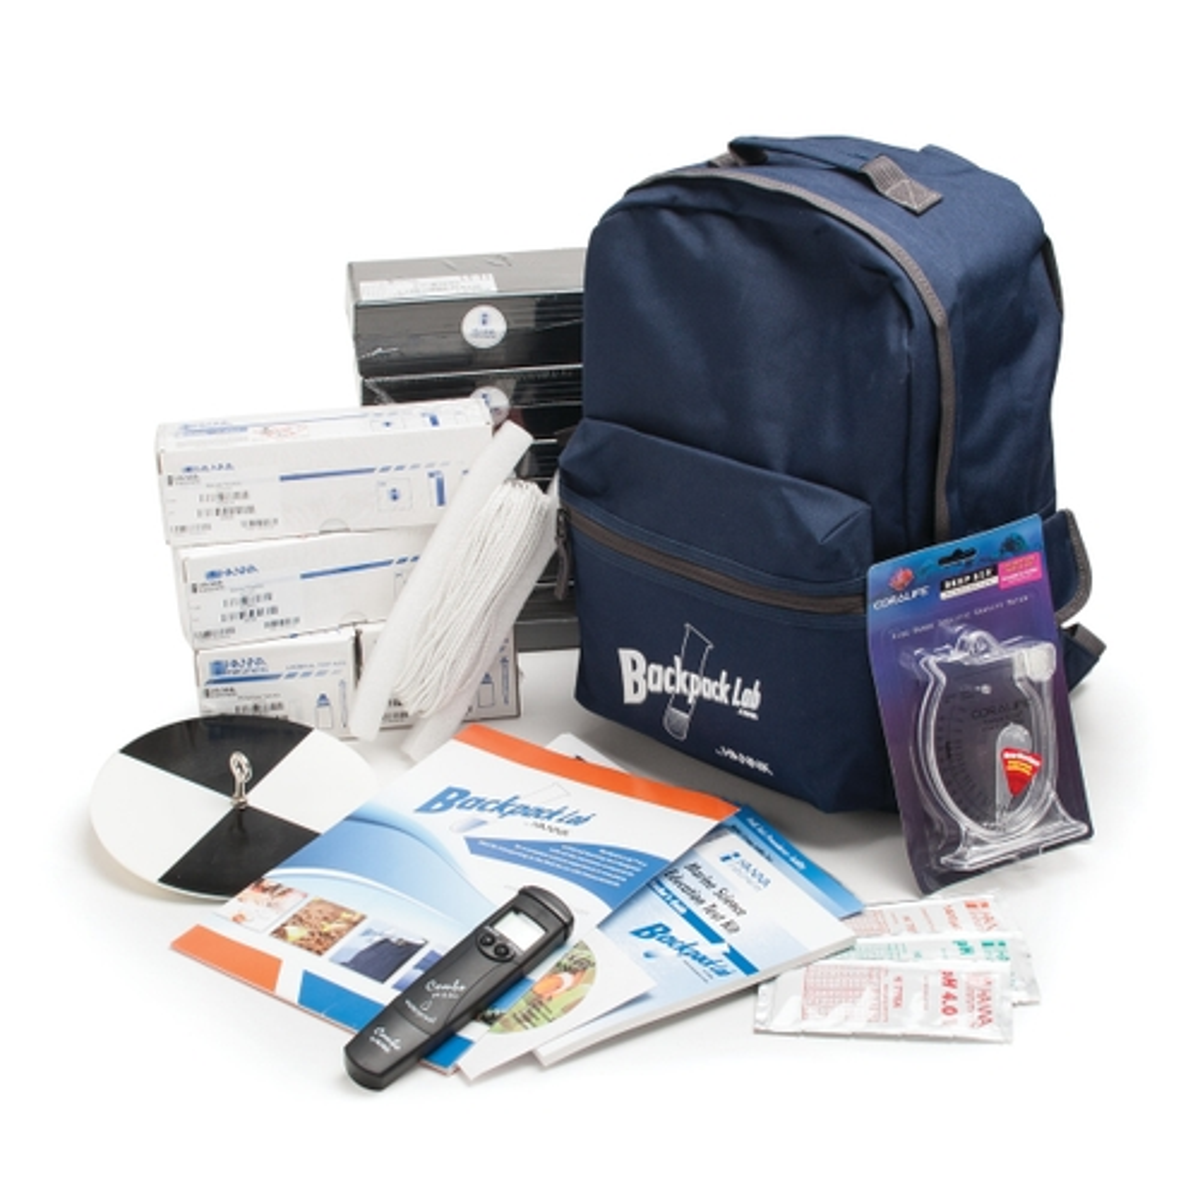 HI3899BP Backpack Lab Marine Science Educational Test Kit